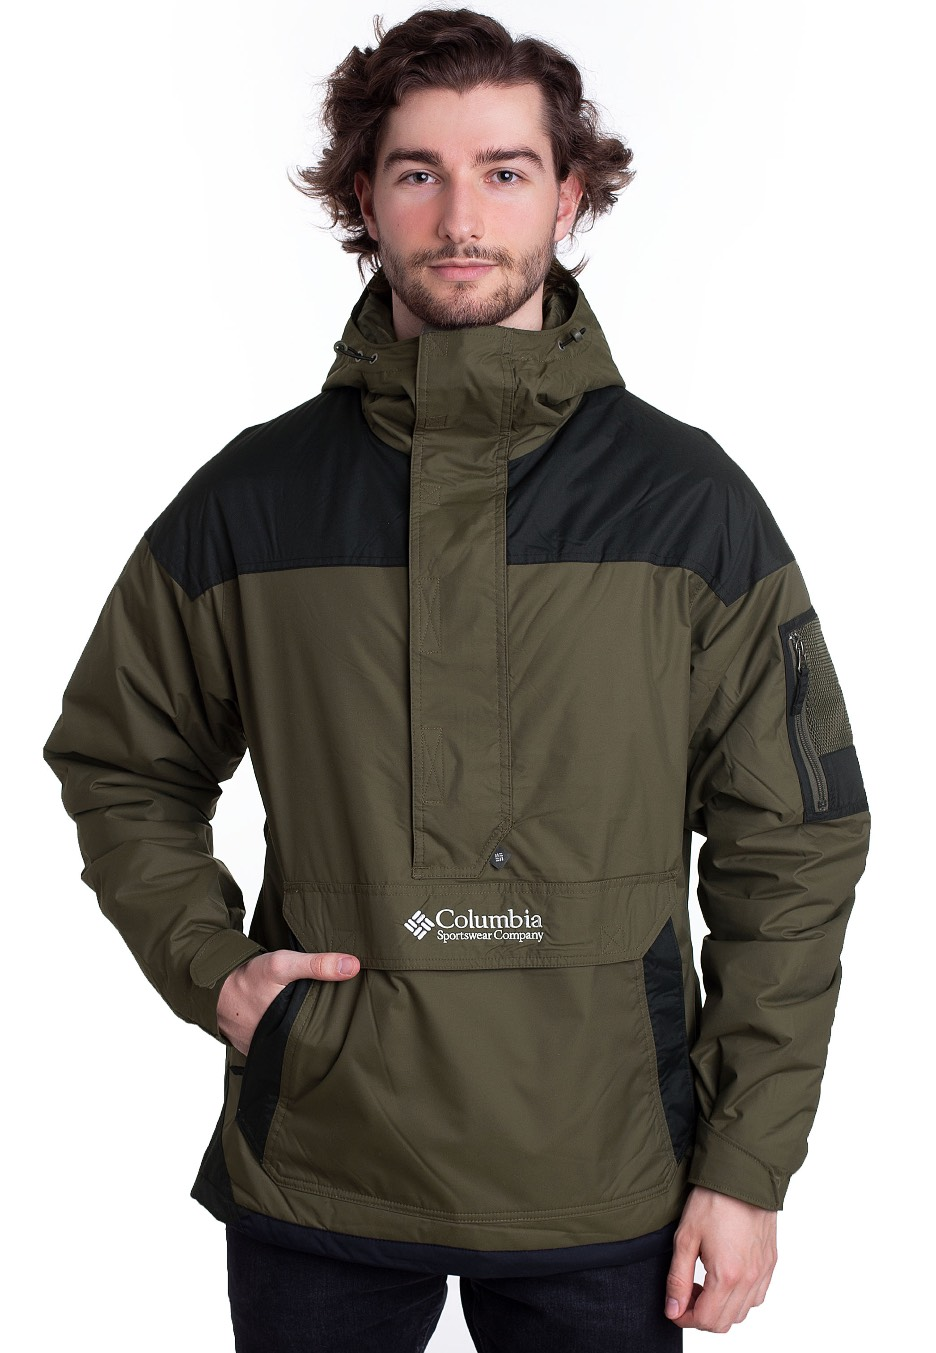 Columbia Challenger PeatmossBlack Jacket